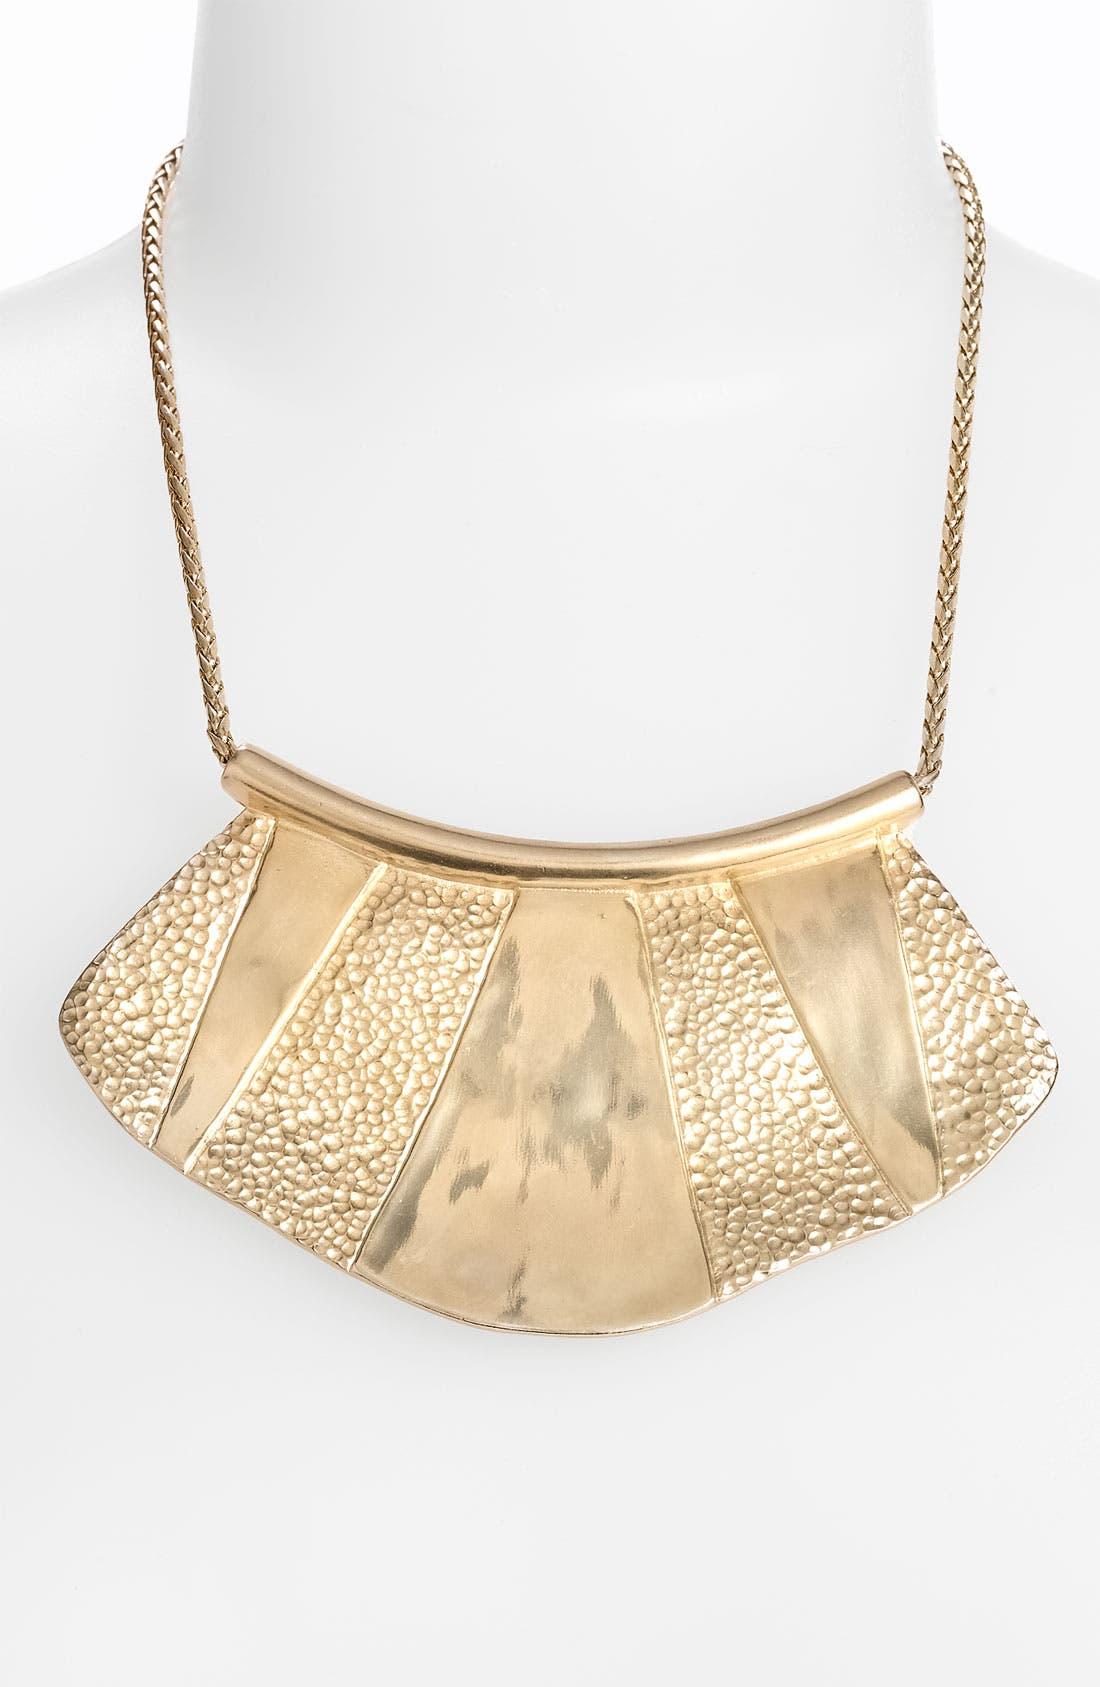 Alternate Image 1 Selected - Nordstrom 'Tribal Metal' Bib Necklace